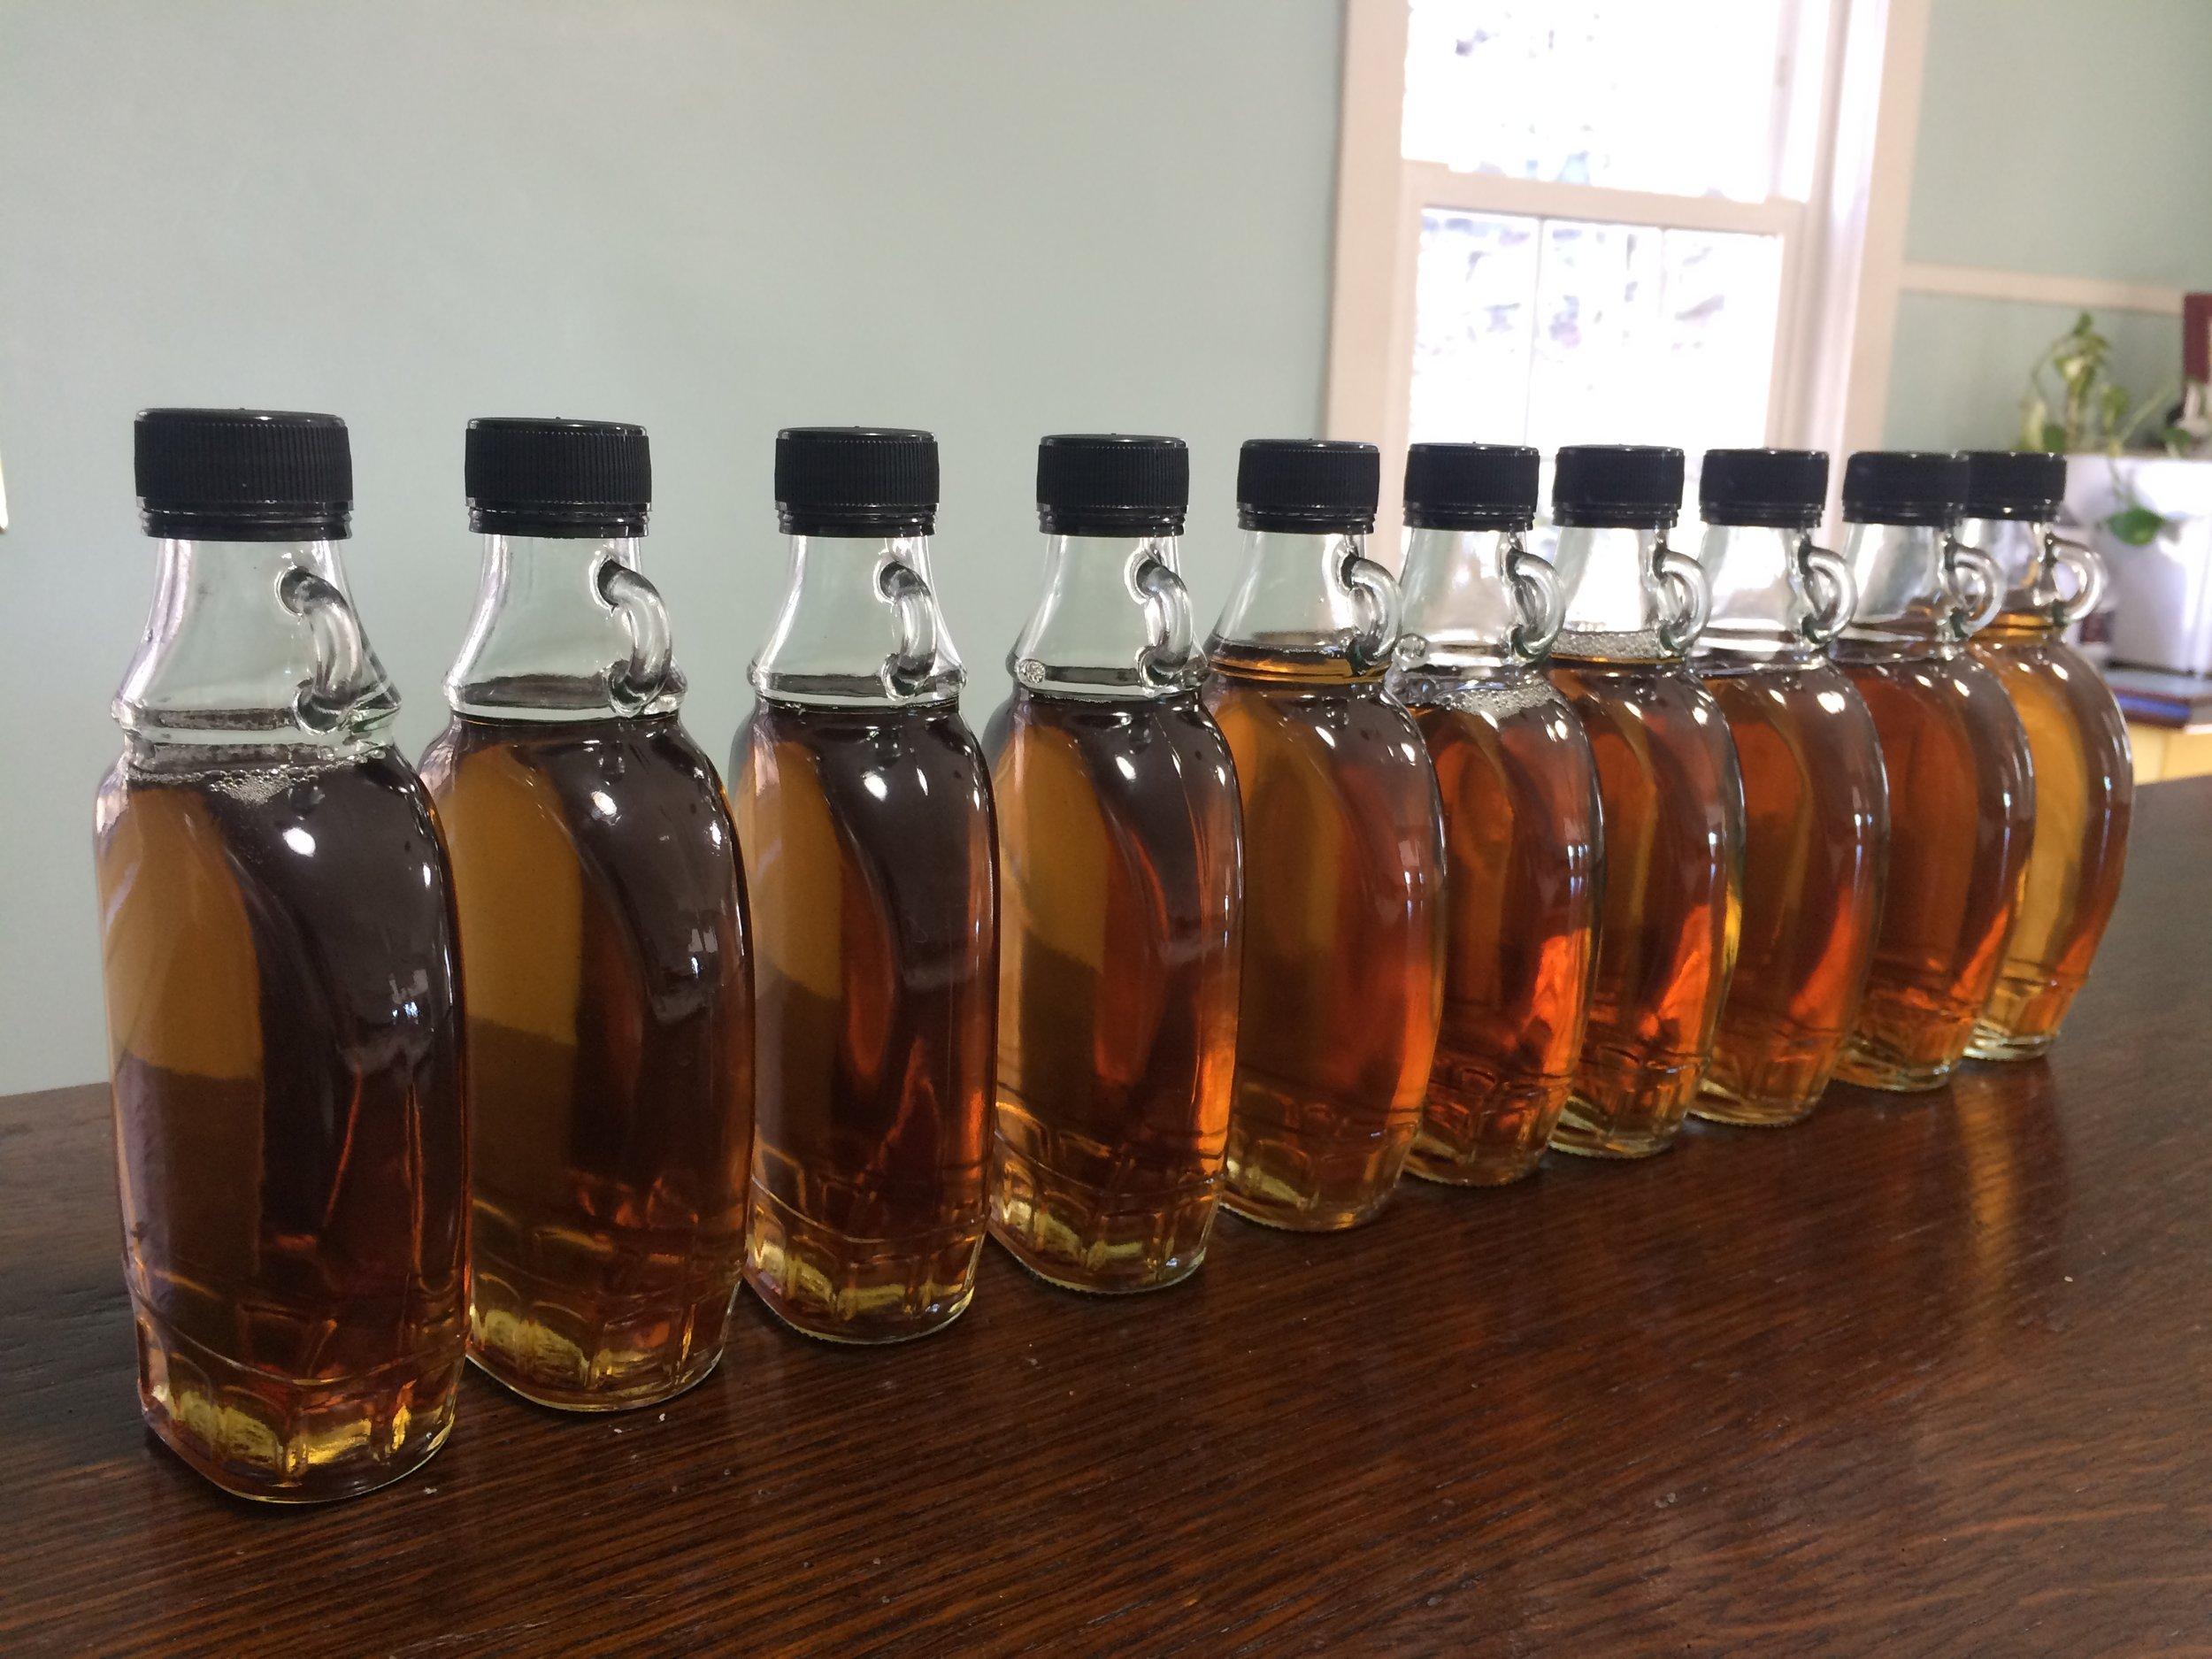 2-21-17 bottles of maple syrup-01.JPG